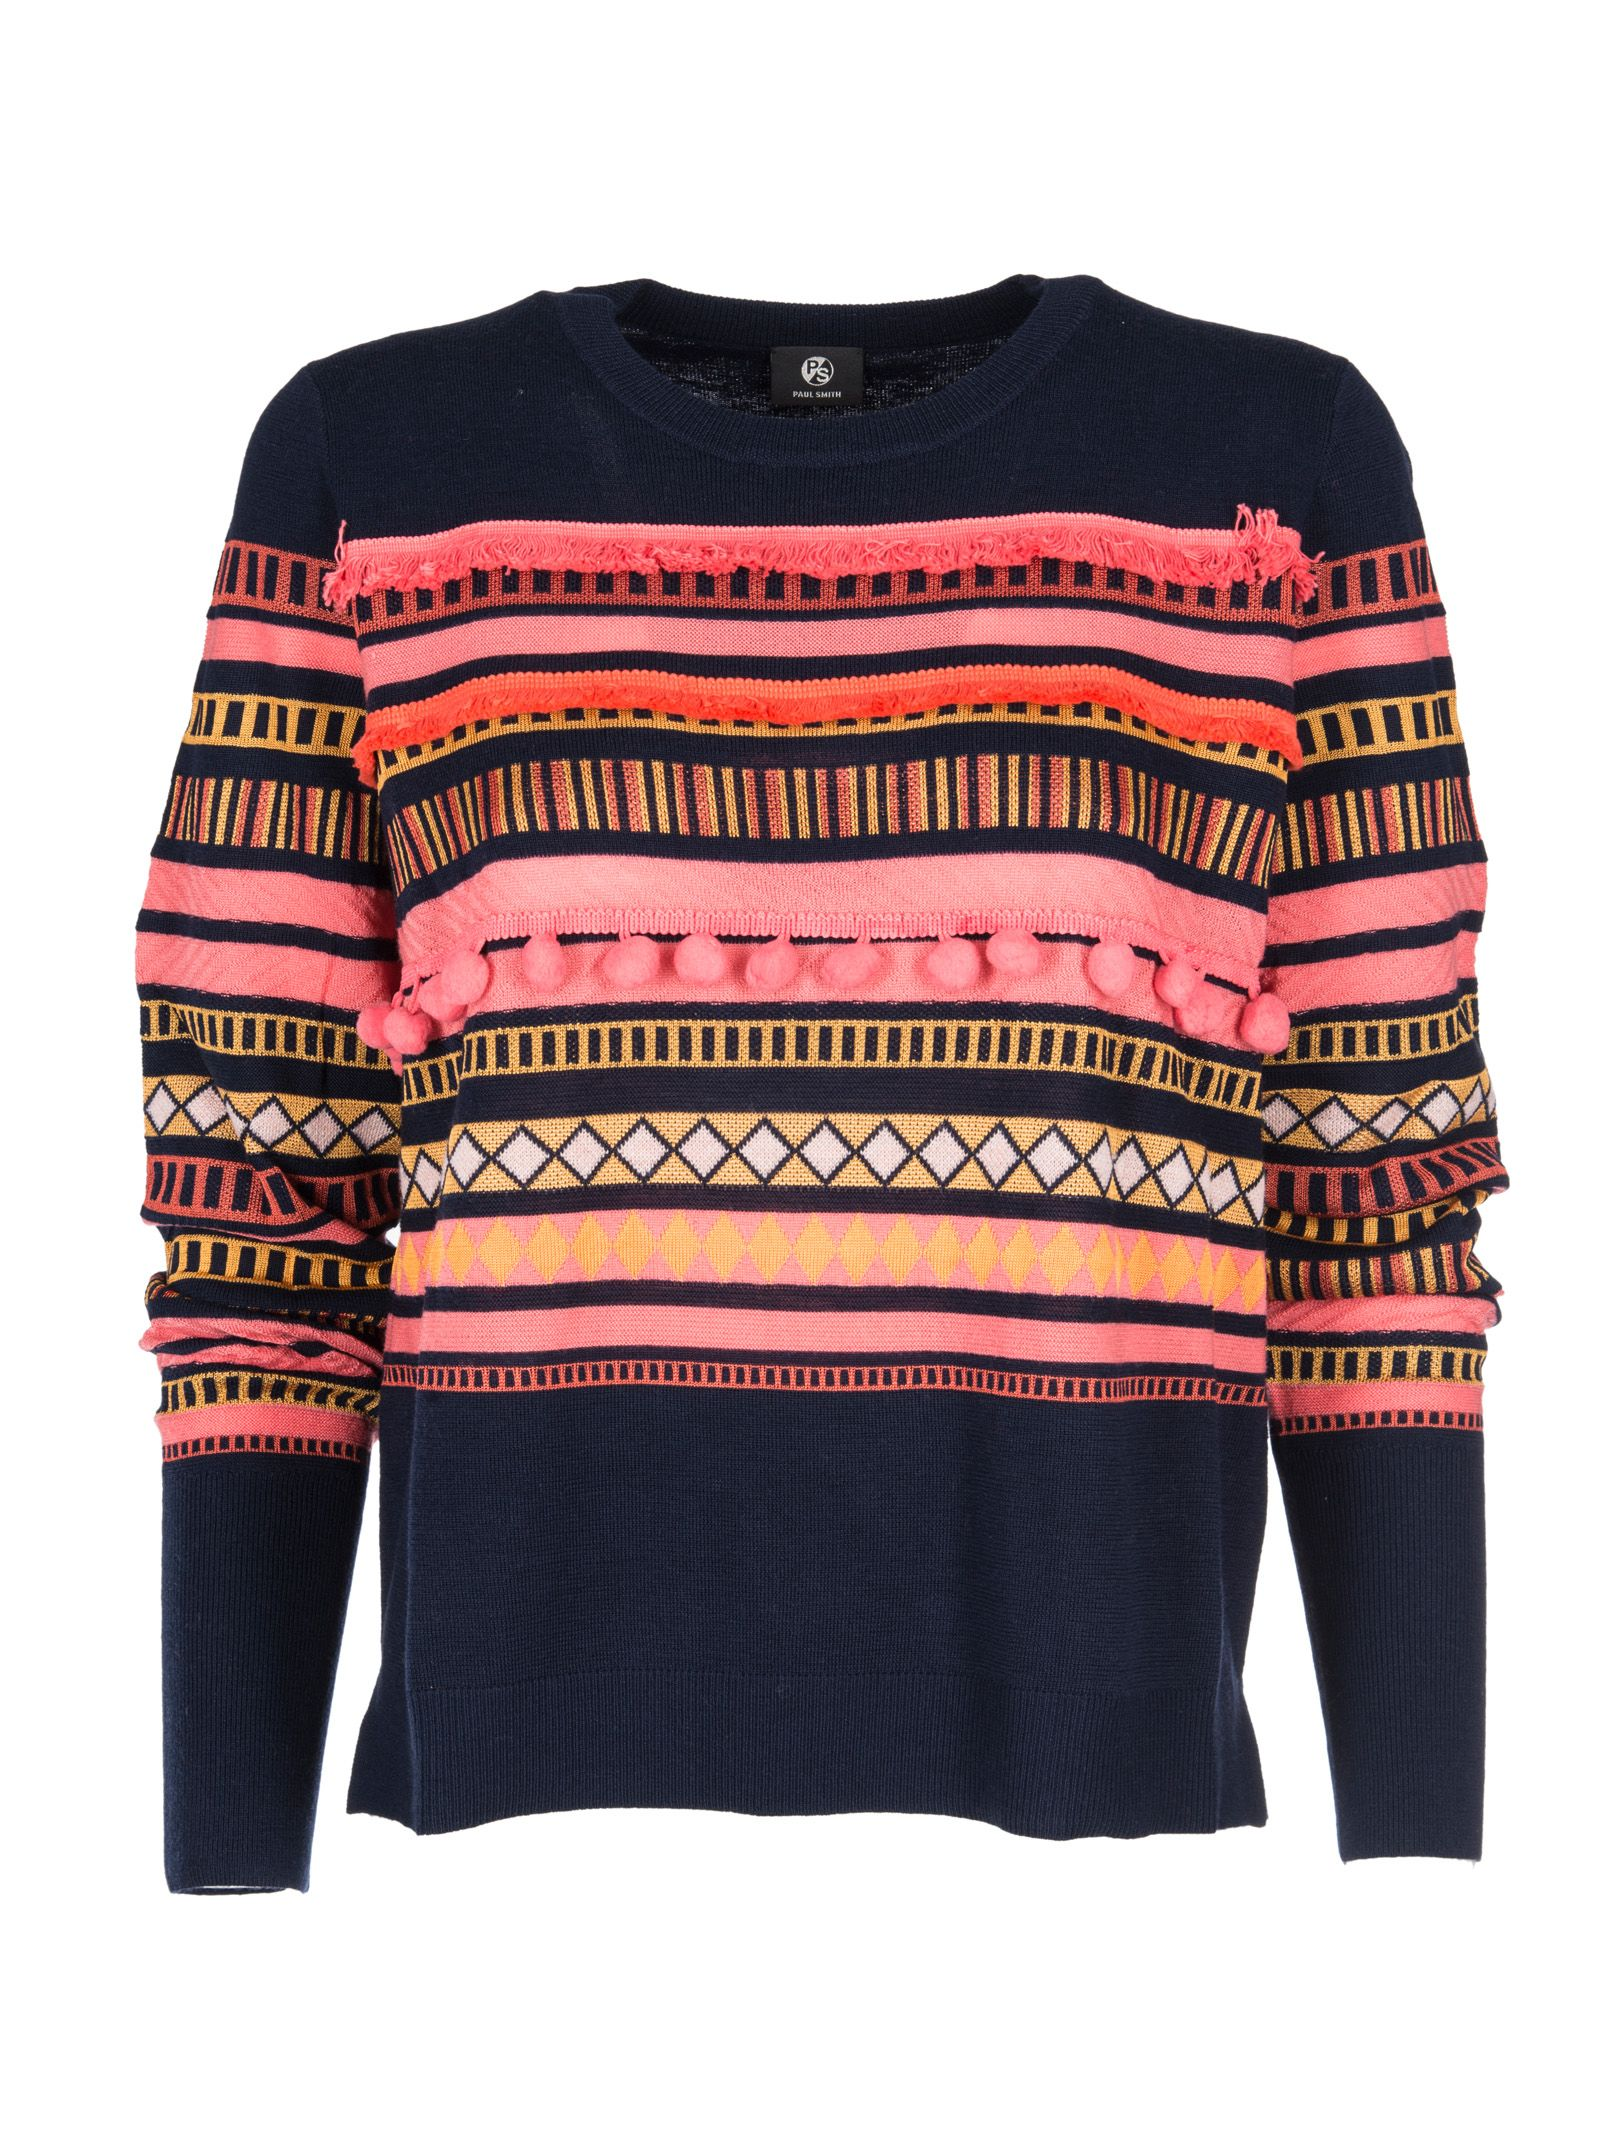 Paul Smith Jacquard Sweater